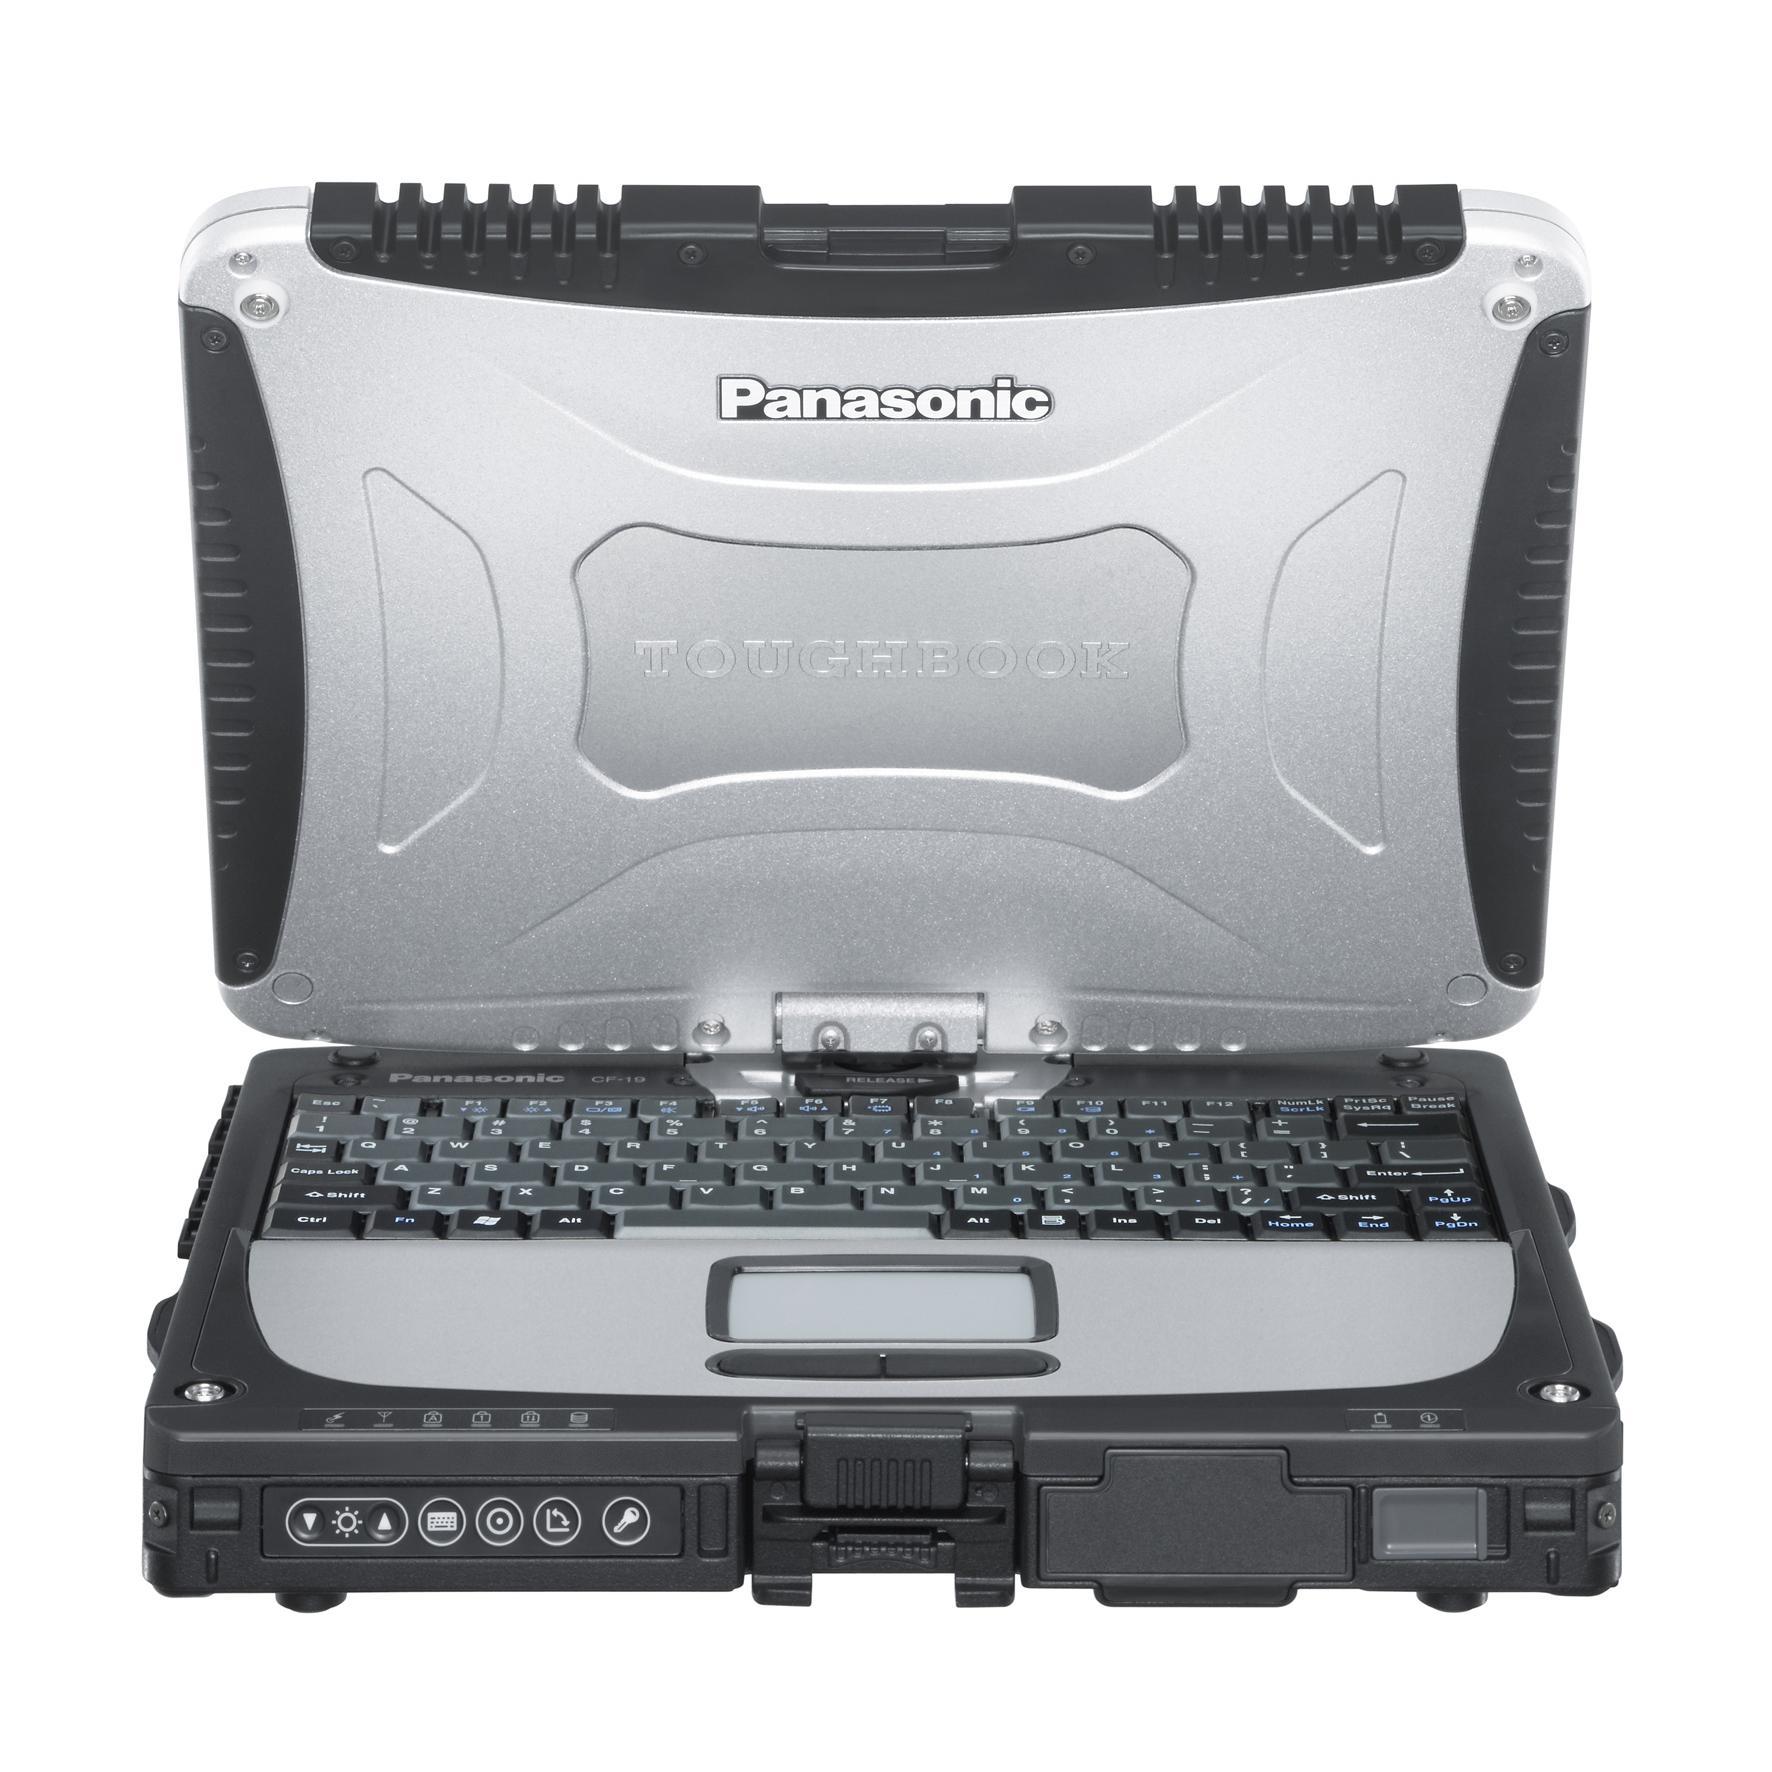 Panasonic CF-19 MK4 - i5-540UM - HDD 128Go SSD - RAM 4 Go - AZERTY